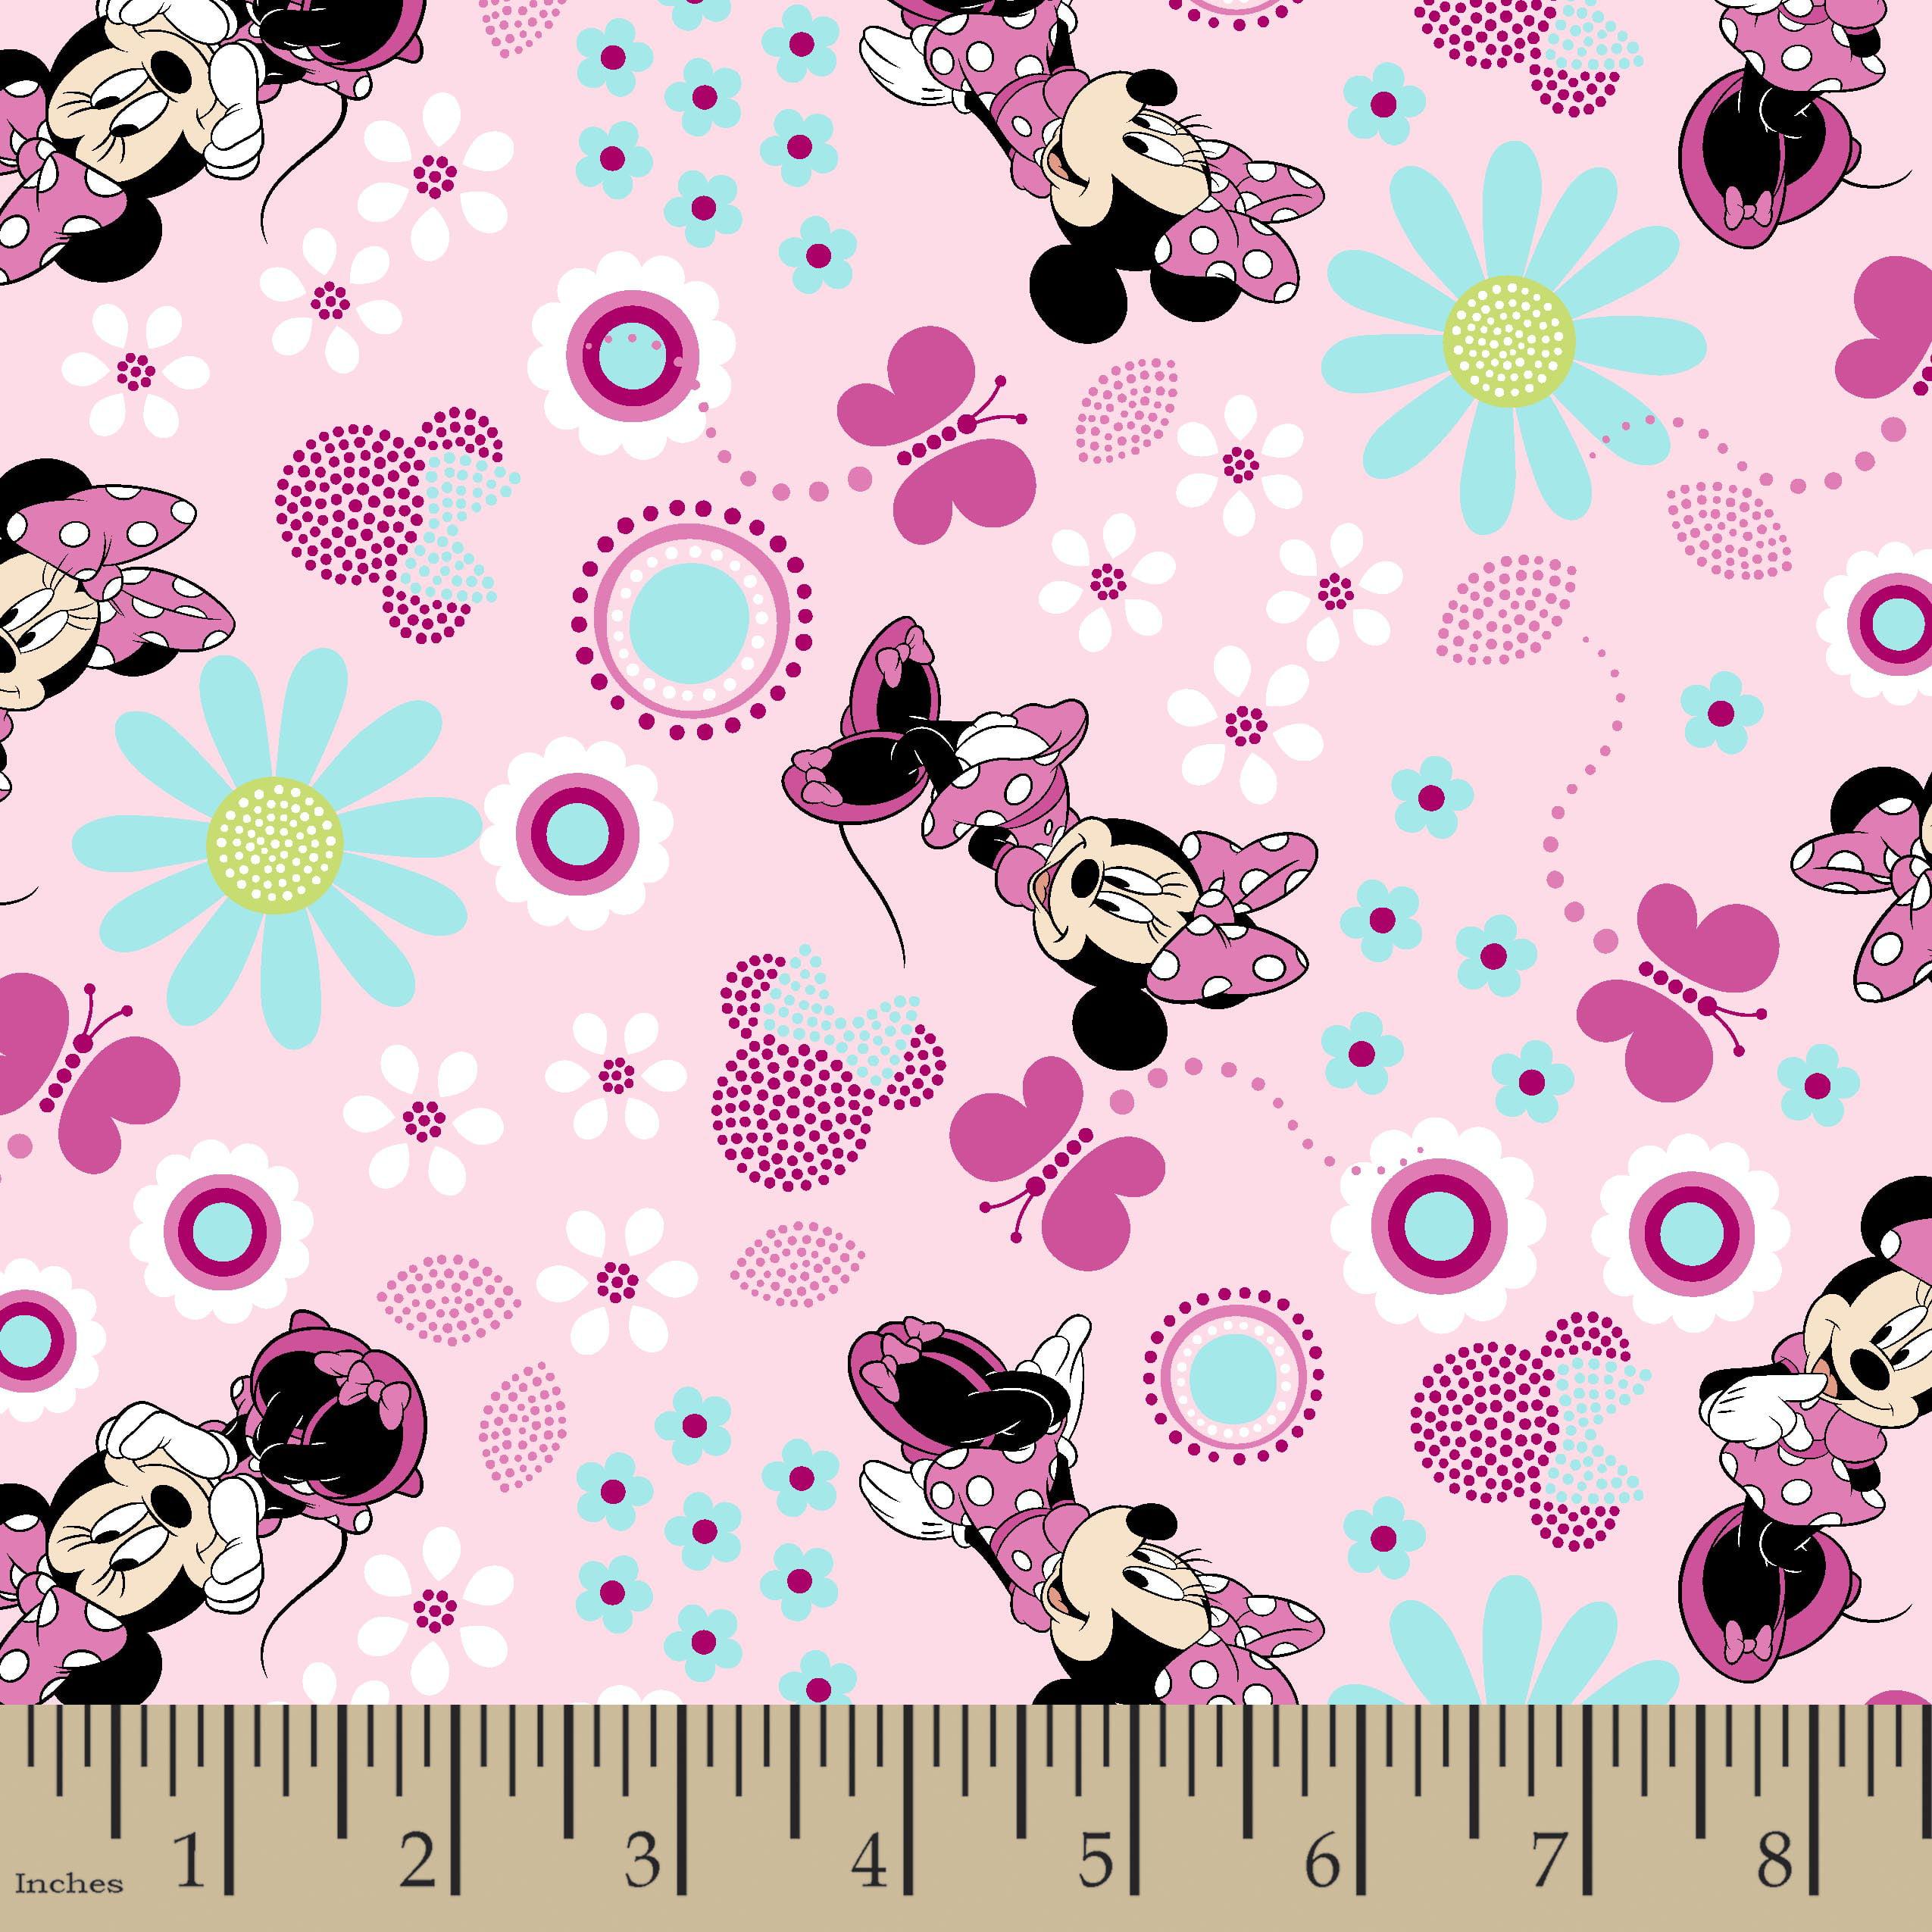 Disney Minnie Minnie Minnie Fabric by the Yard